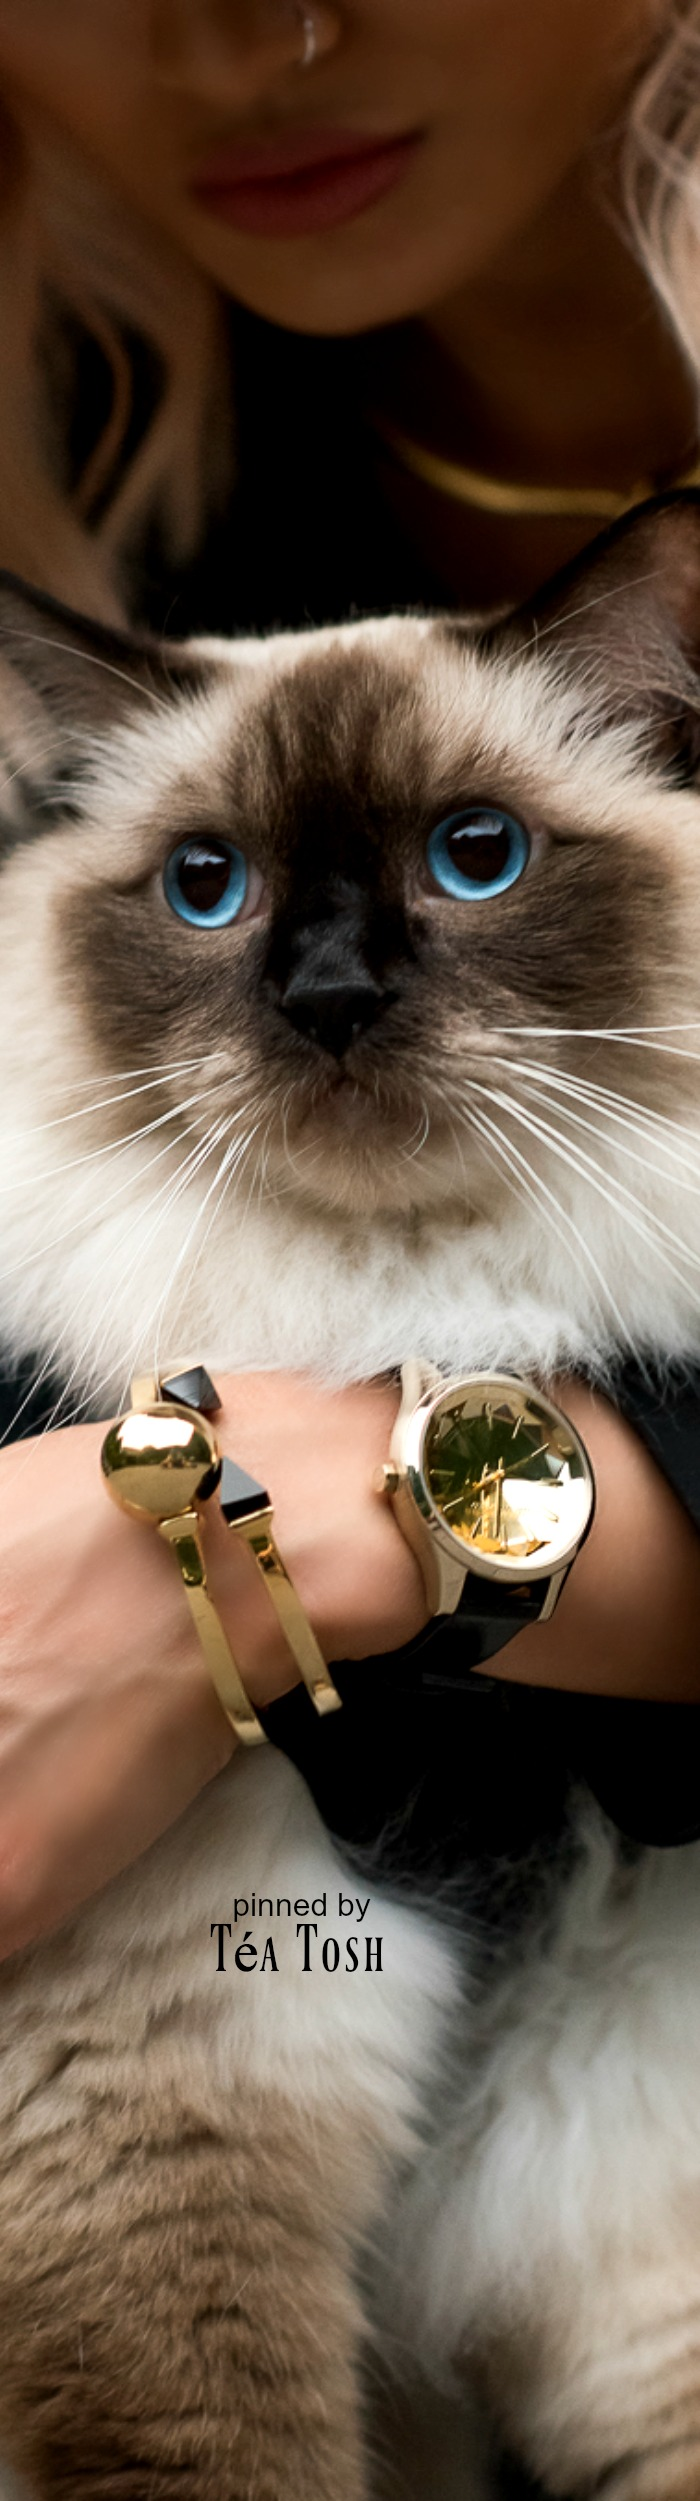 Téa Tosh Micah Gianneli Karl Lagerfeld Ragdoll Choupette